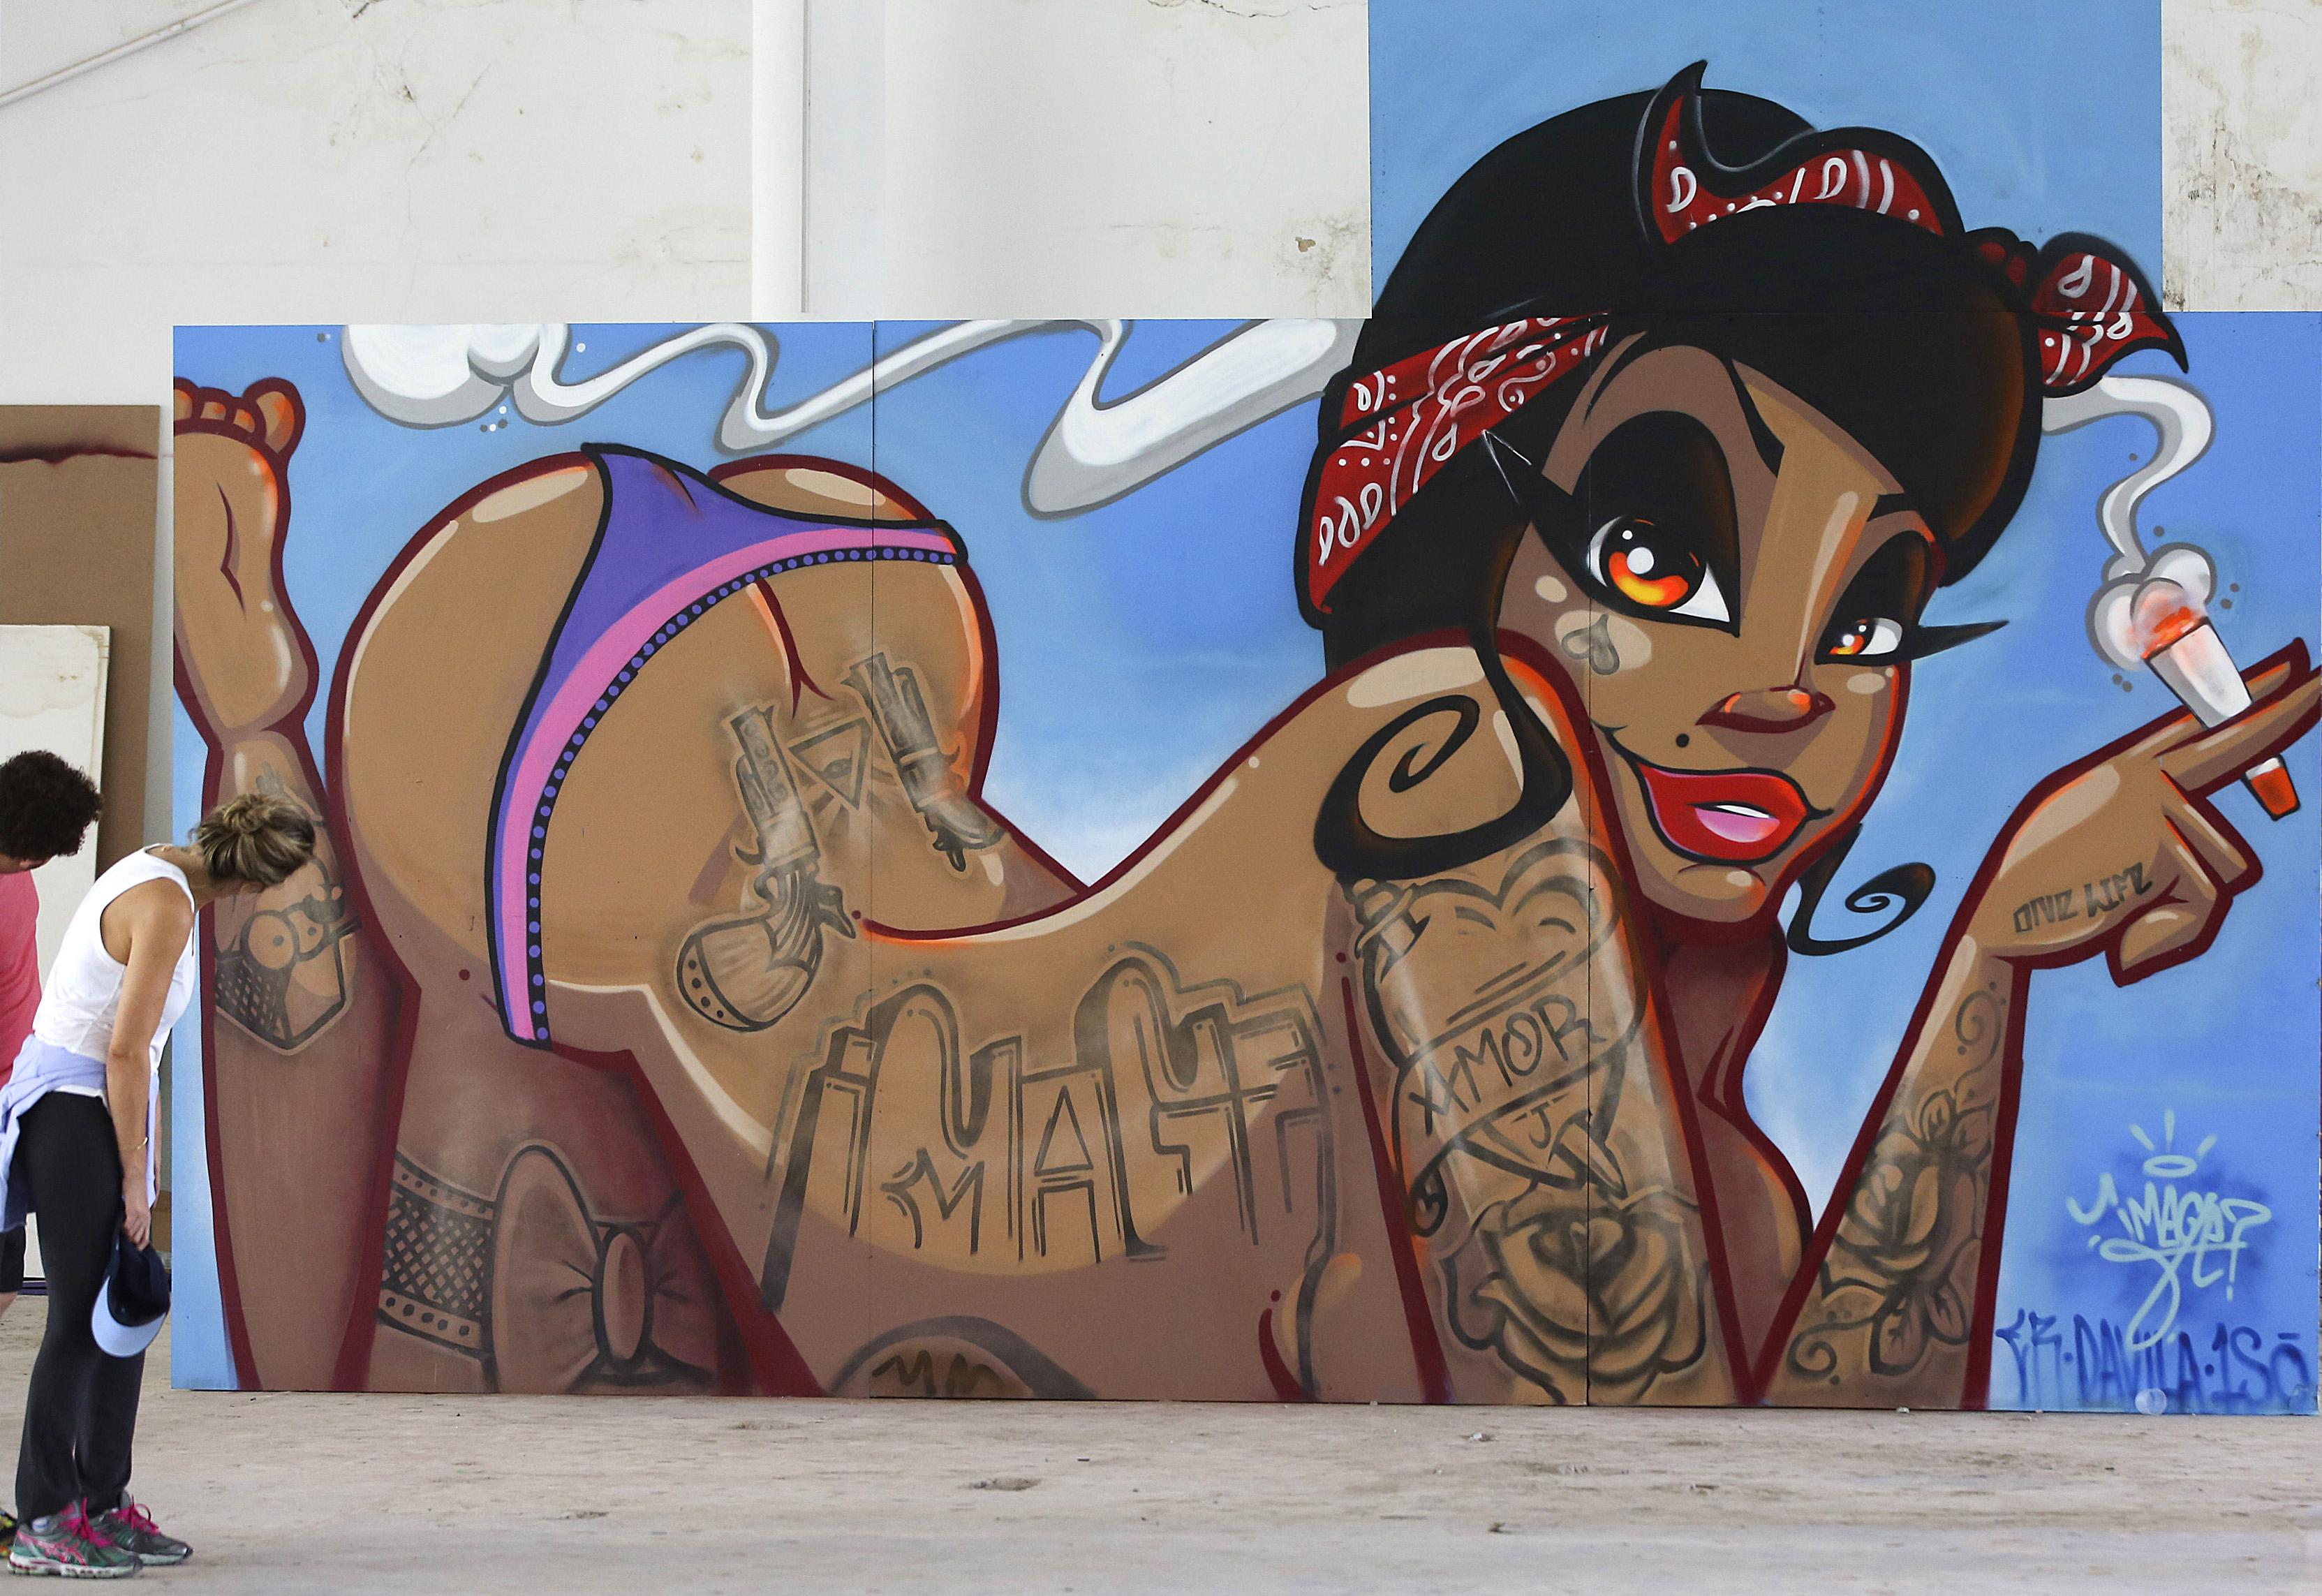 Sexy Graffiti By Kandeedrawings On Deviantart